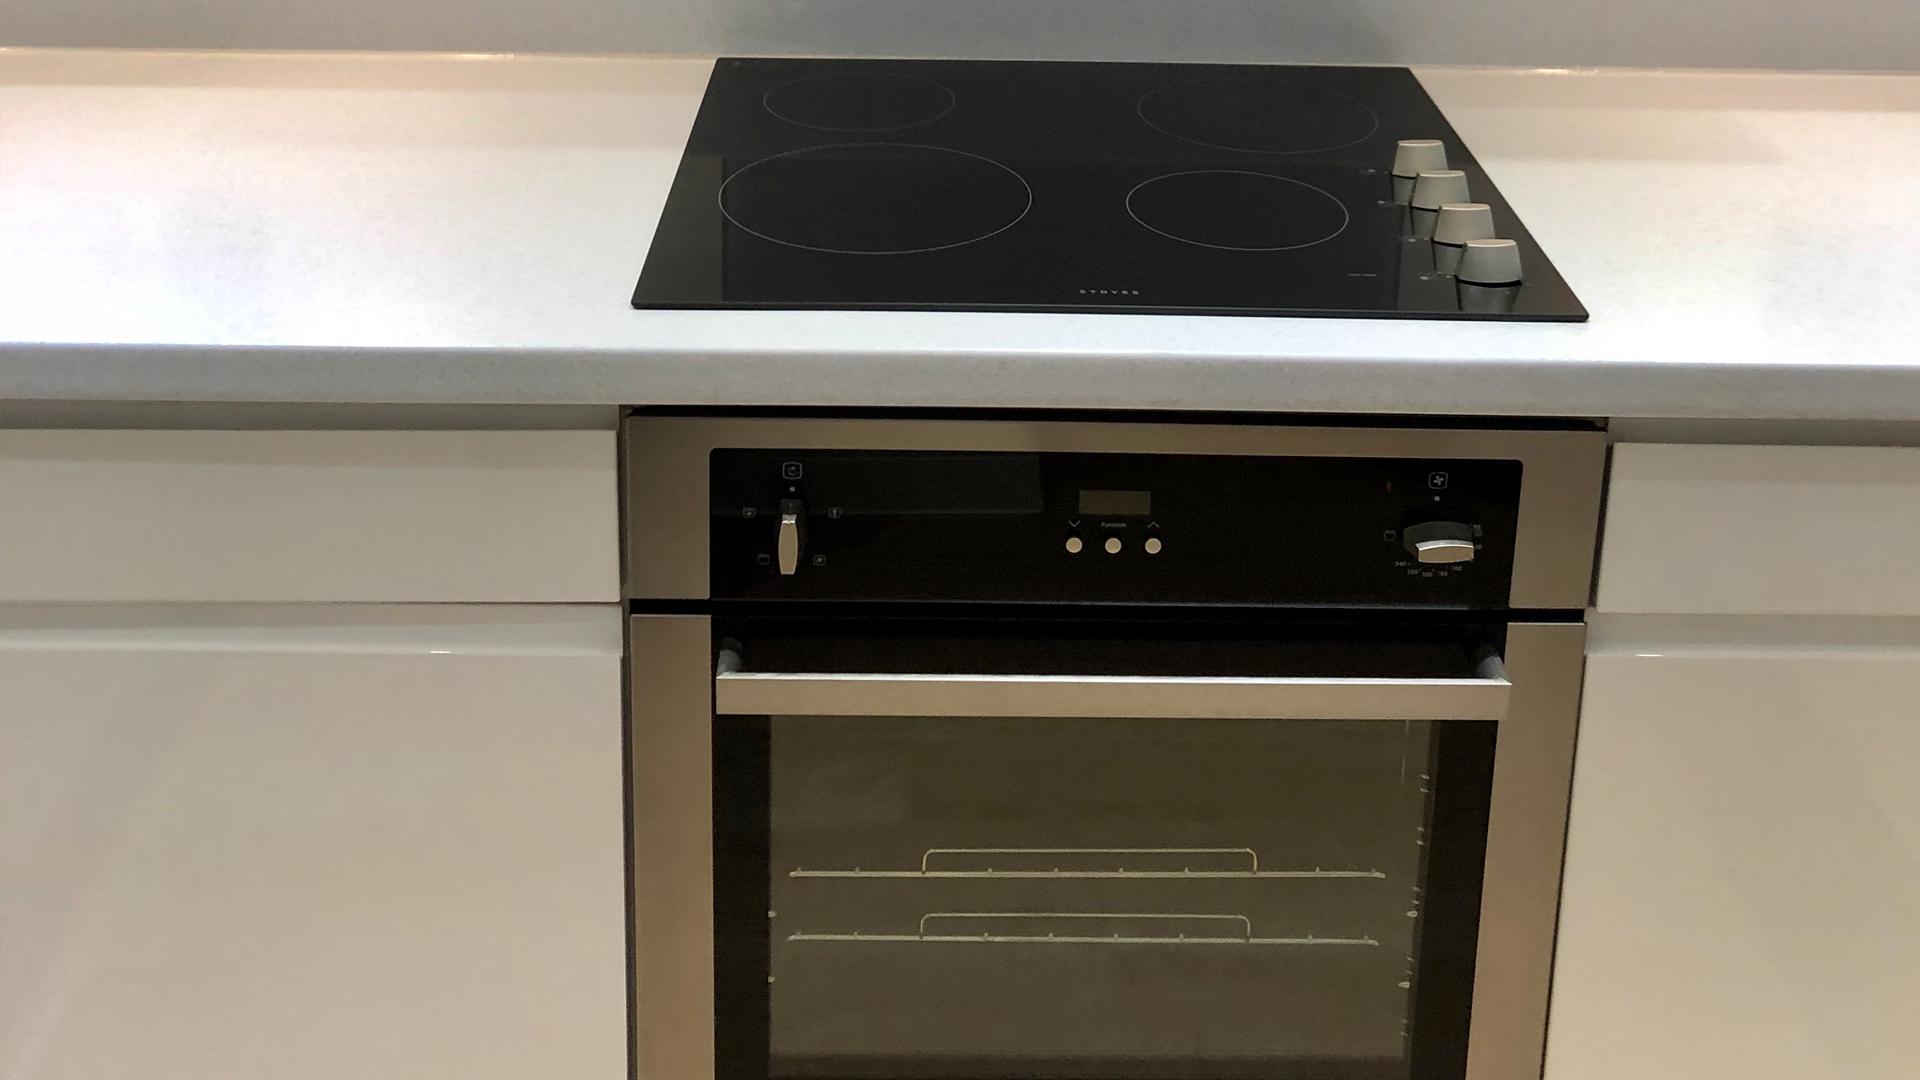 http://www.corepropertysolutions.co.uk/wp-content/uploads/2019/06/kitchen5.jpg